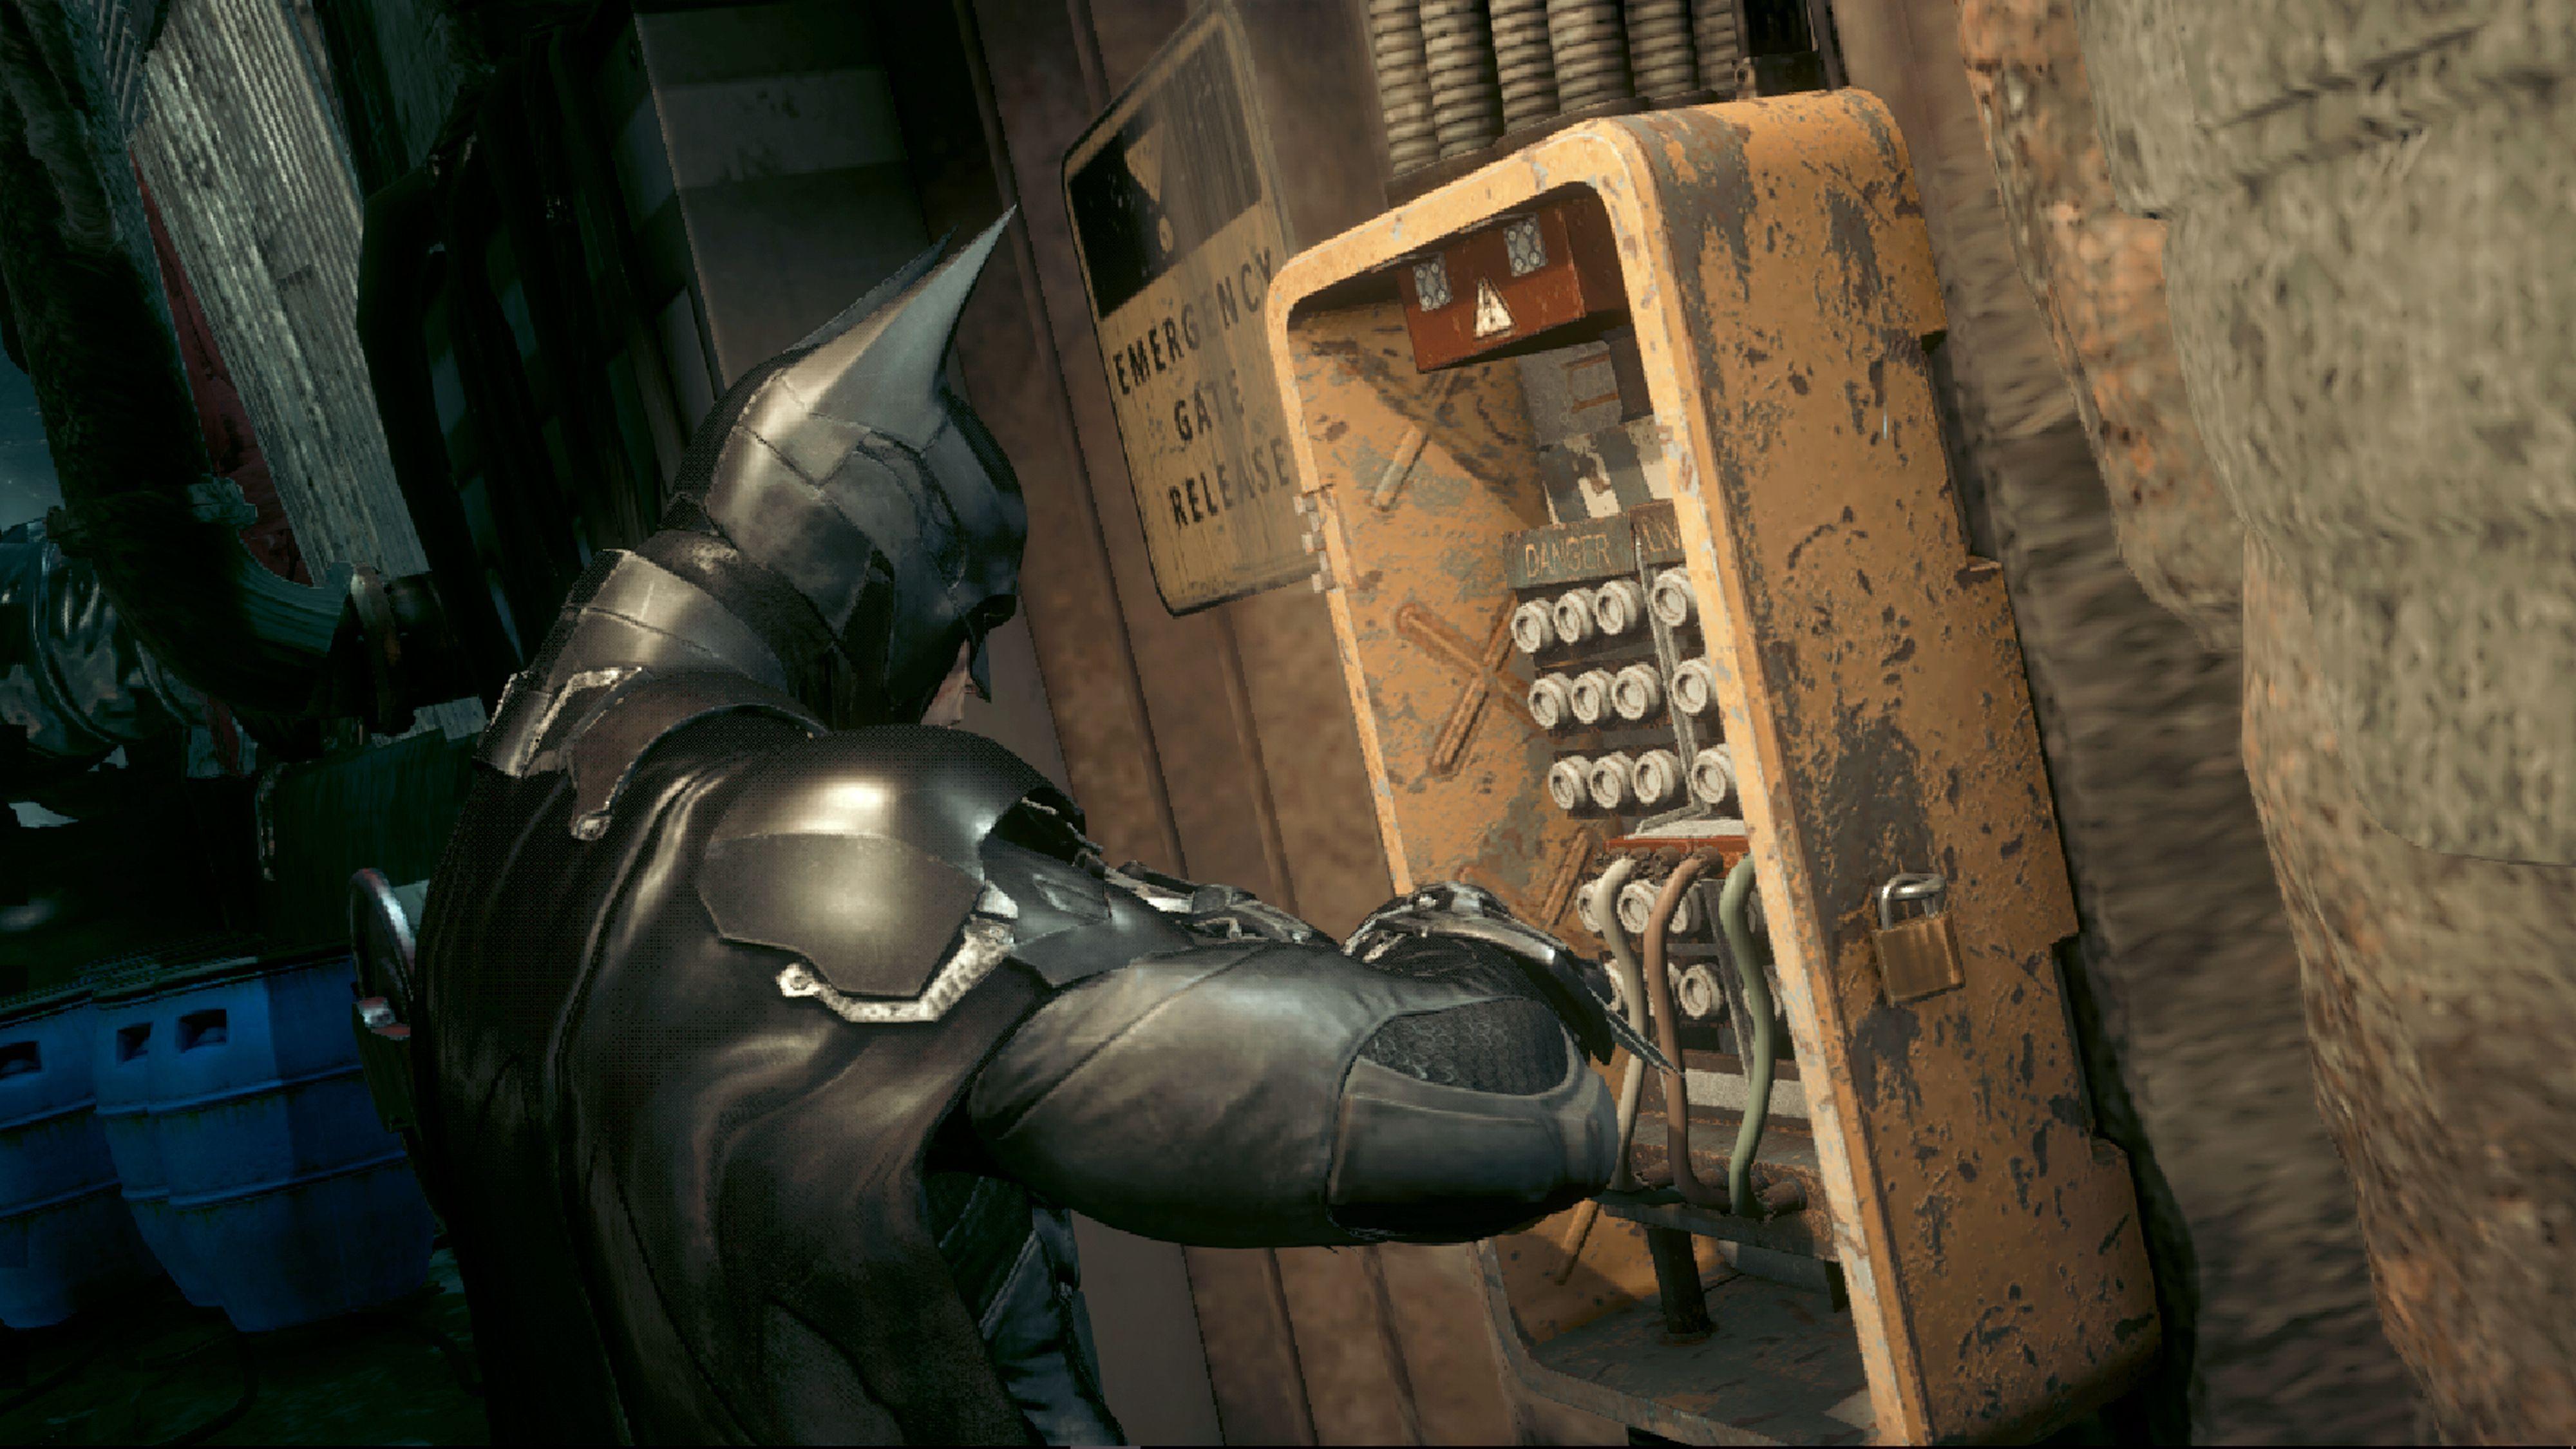 batman arkham knight hot wiring the door inside ace chemicals rh pinterest co uk Wiring a Hot Tub Spa Hot Rod Wiring Diagram Online